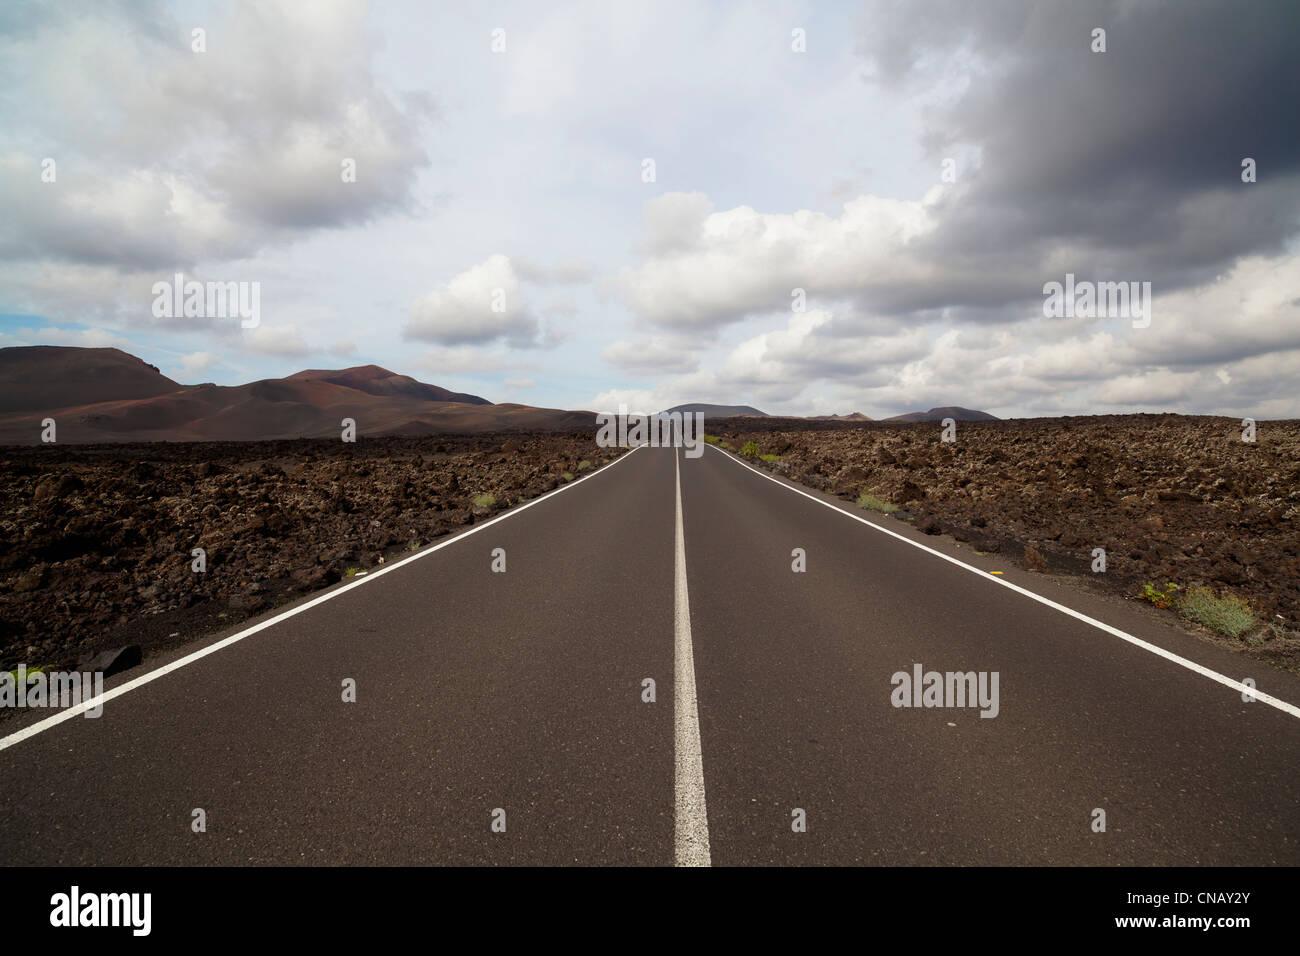 Paved road in rural landscape - Stock Image